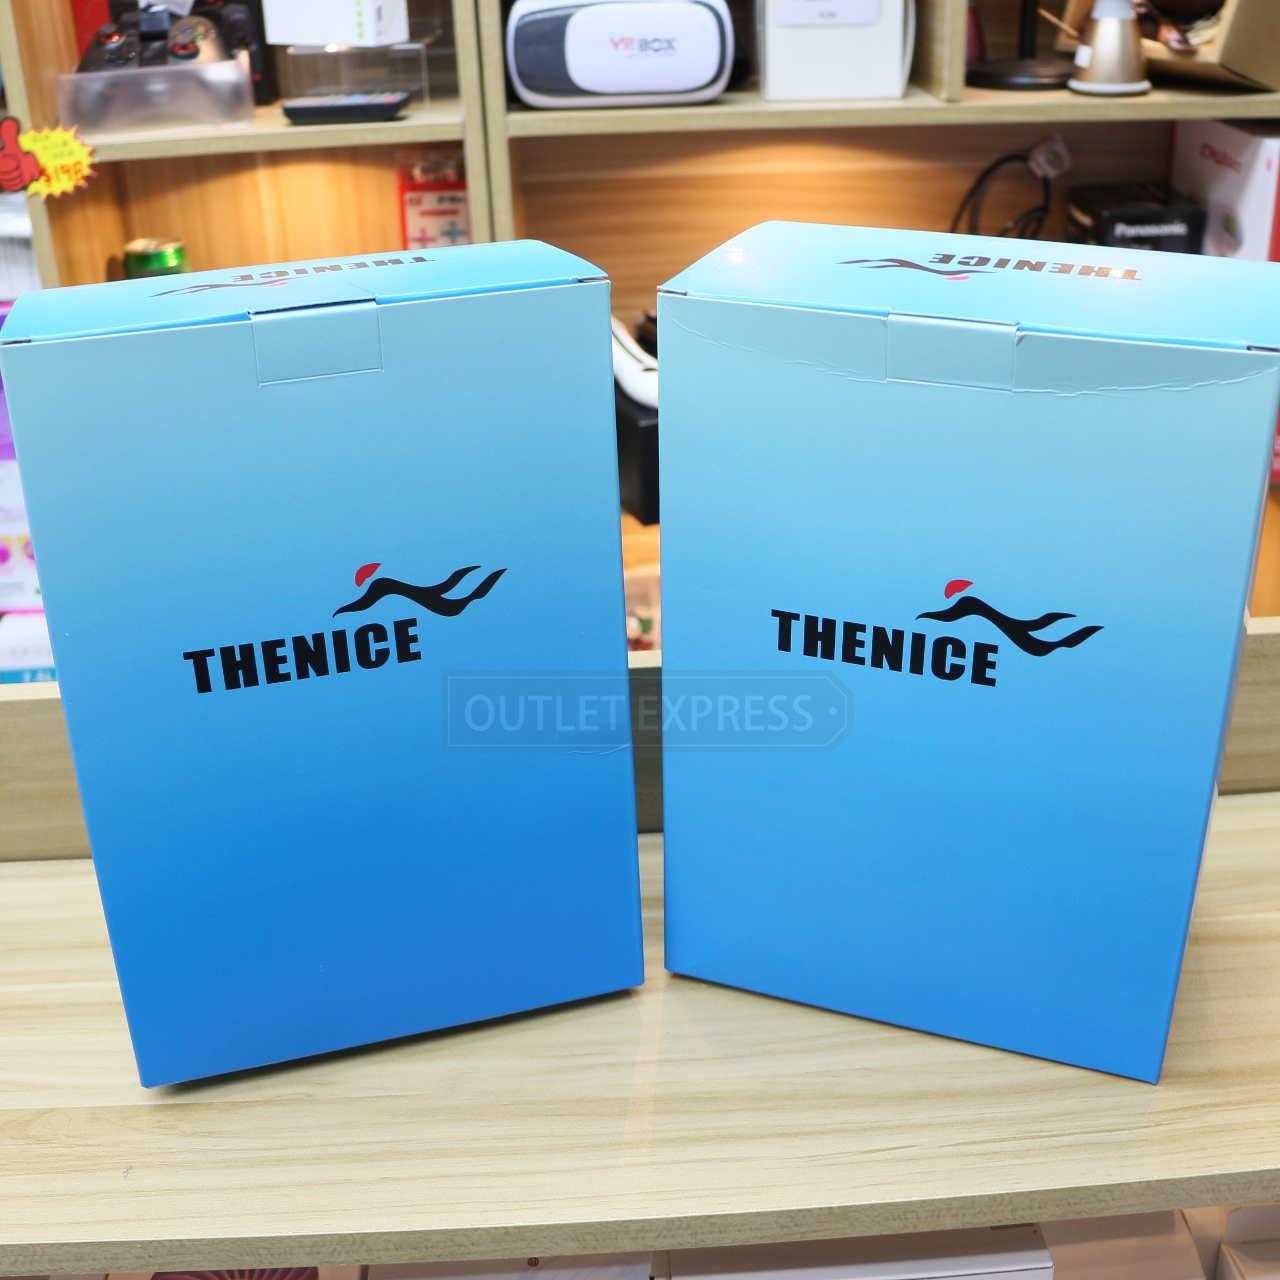 THENICE全乾式防霧浮潛面罩 包裝盒- Outlet Express HK生活百貨城實拍相片